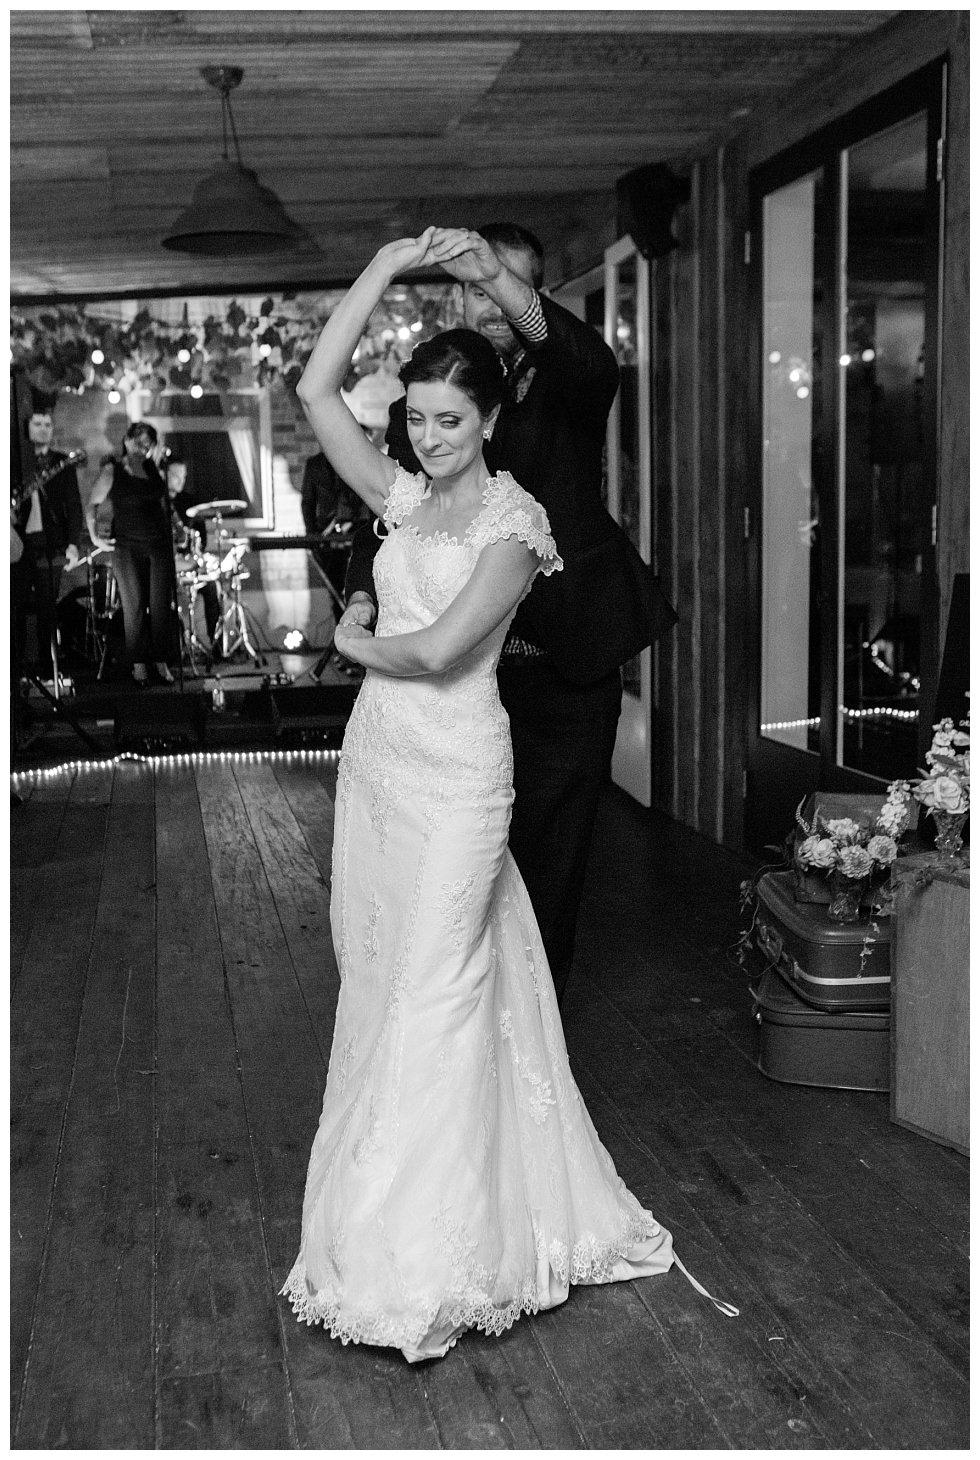 ArtyJ Photography | © Popcorn Photography – Used with Permission, Mindaribba, Mindaribba House, Wedding, Australia, NSW, Hunter Valley, Photography, Autumn Wedding | Lucy & Daniel | Wedding